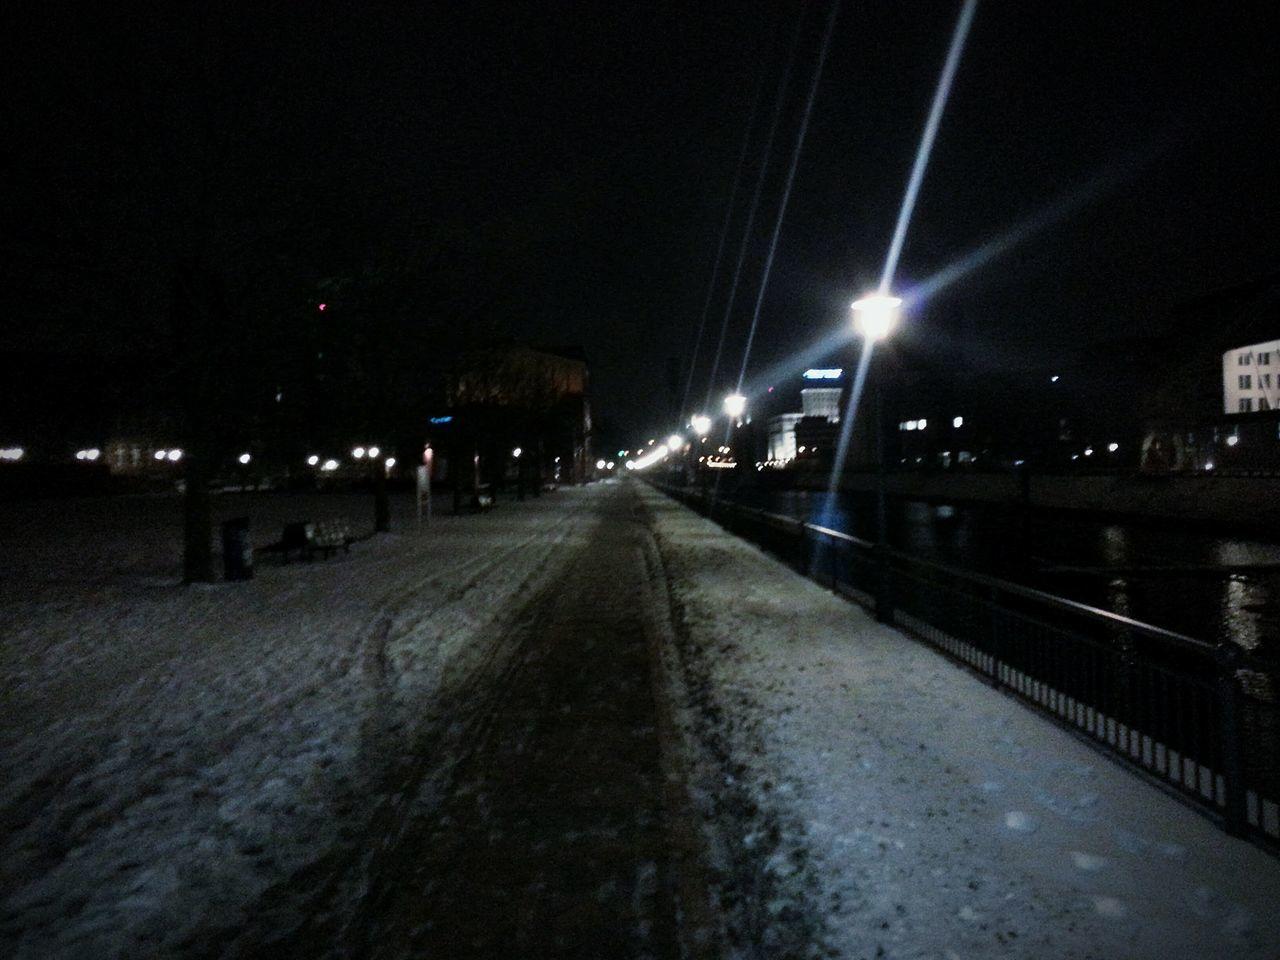 illuminated, night, the way forward, transportation, street light, no people, road, building exterior, architecture, outdoors, sky, city